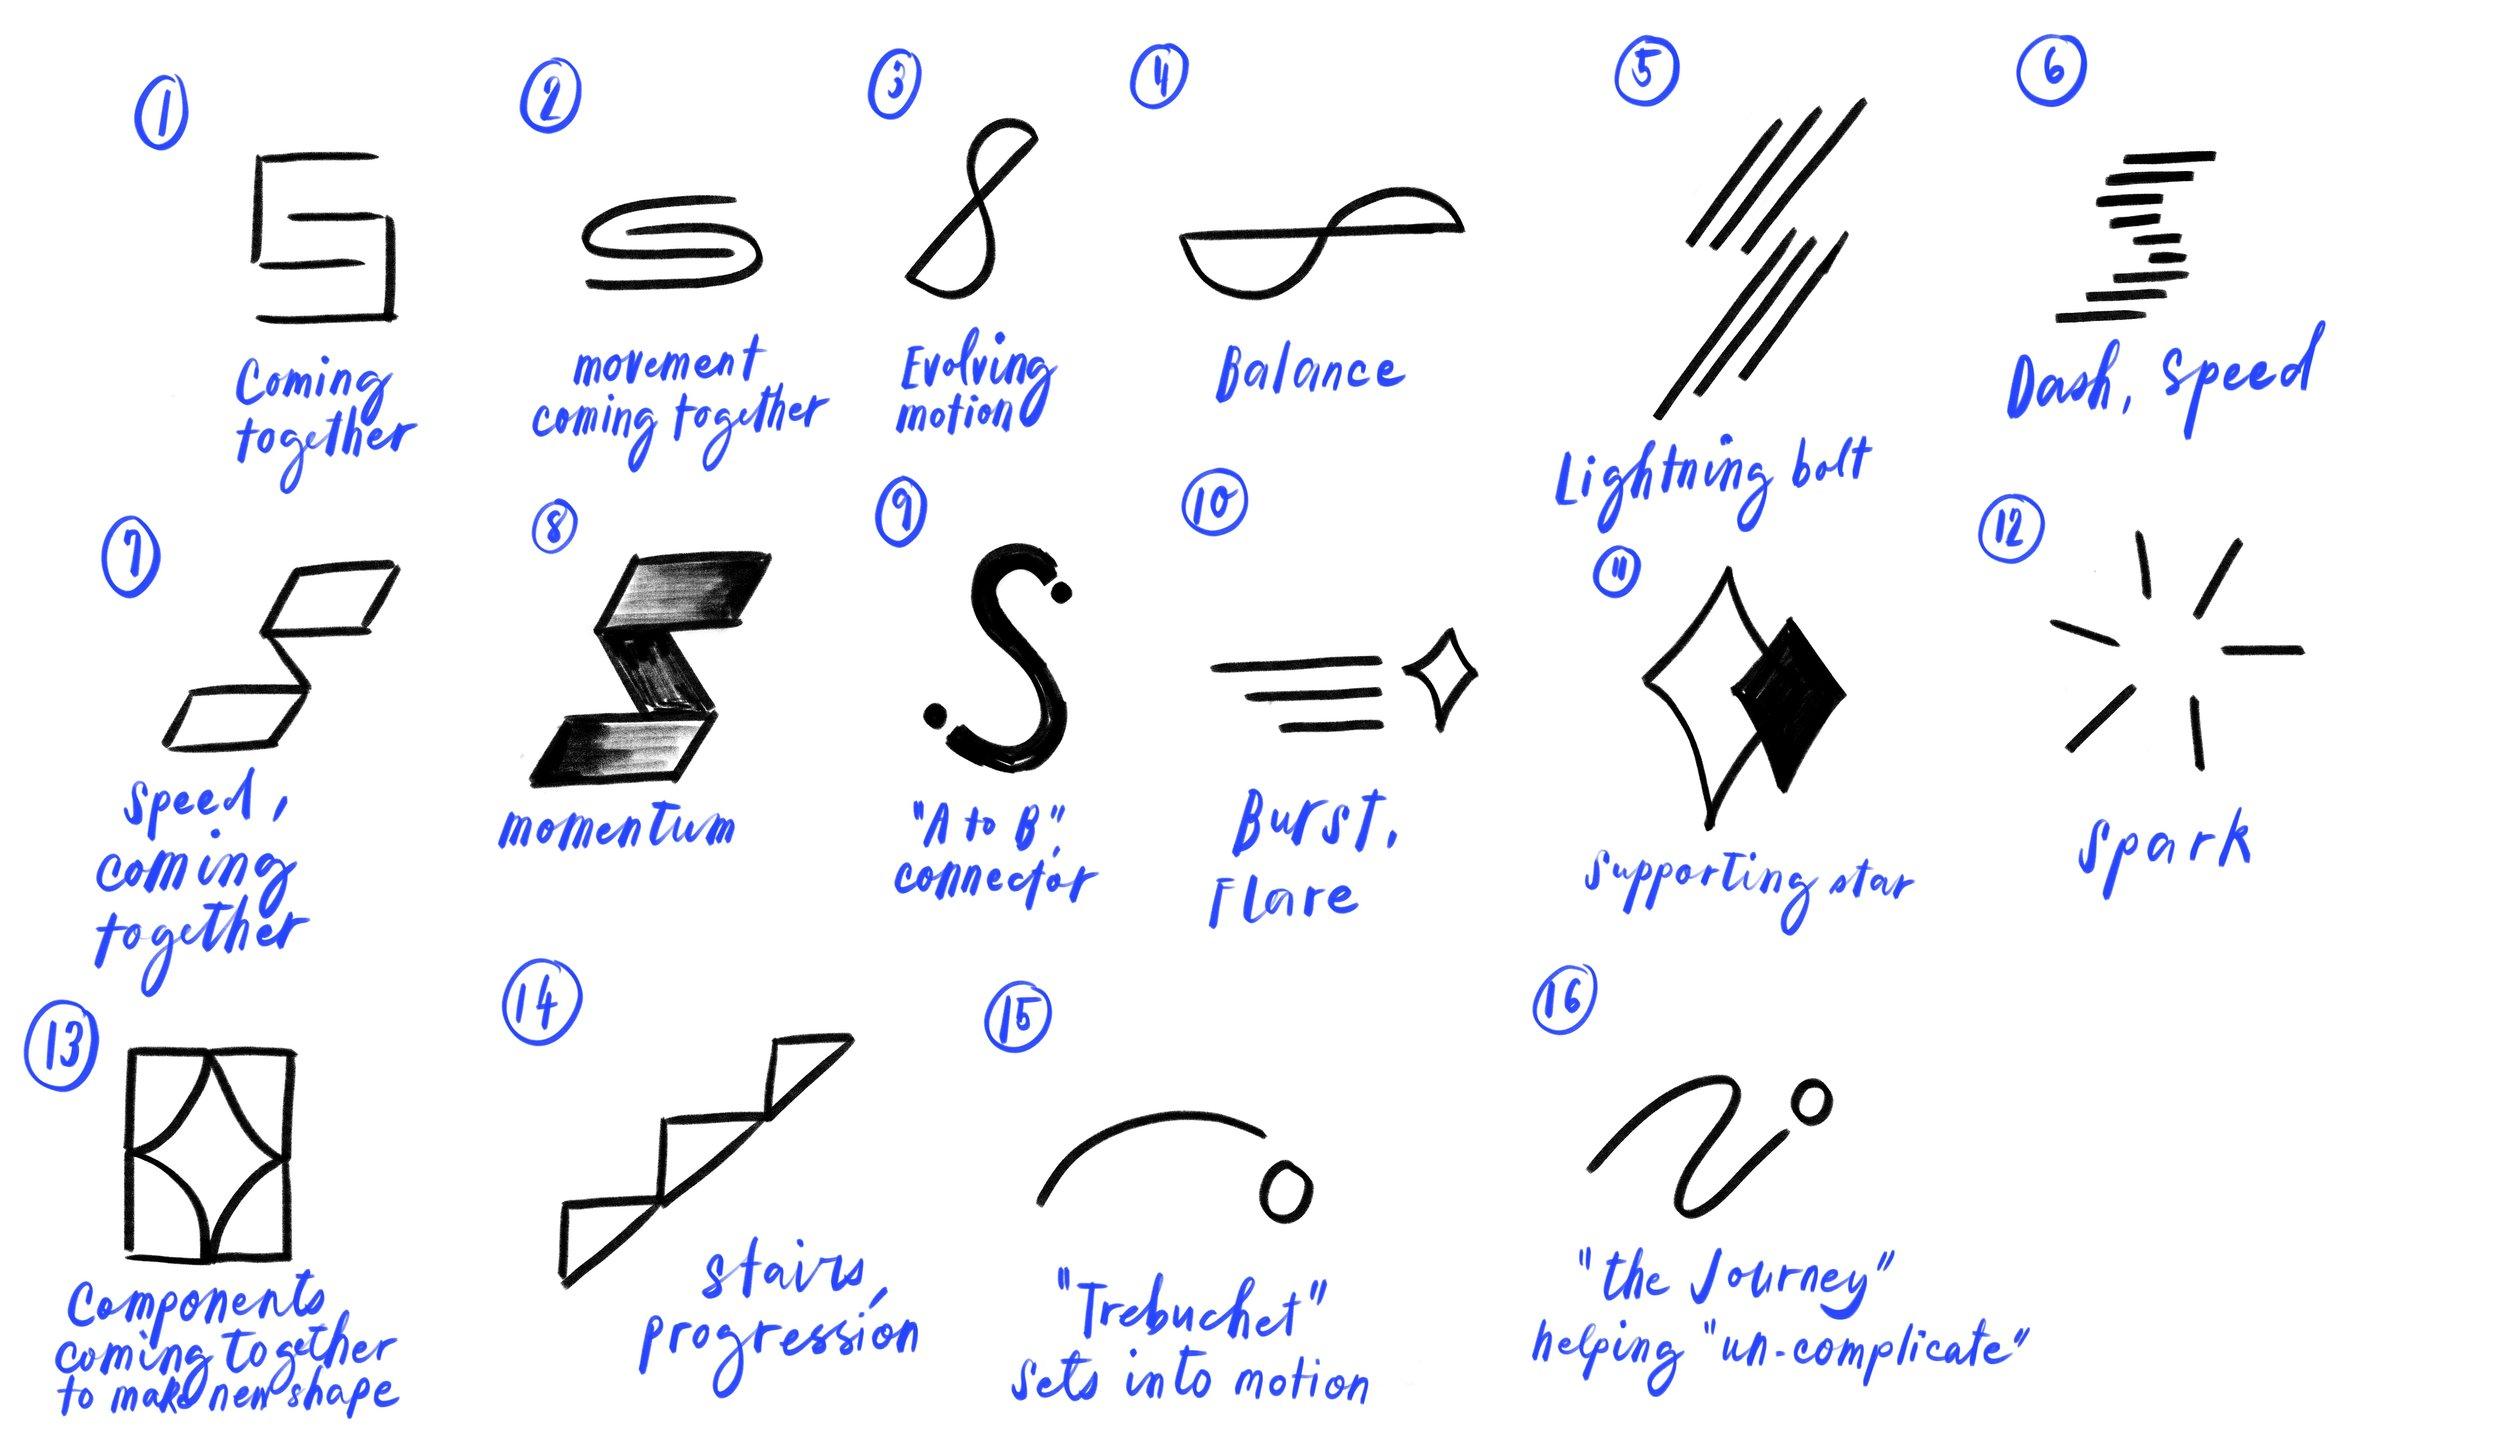 Brand-Explorations-1-Sketch_1.jpg